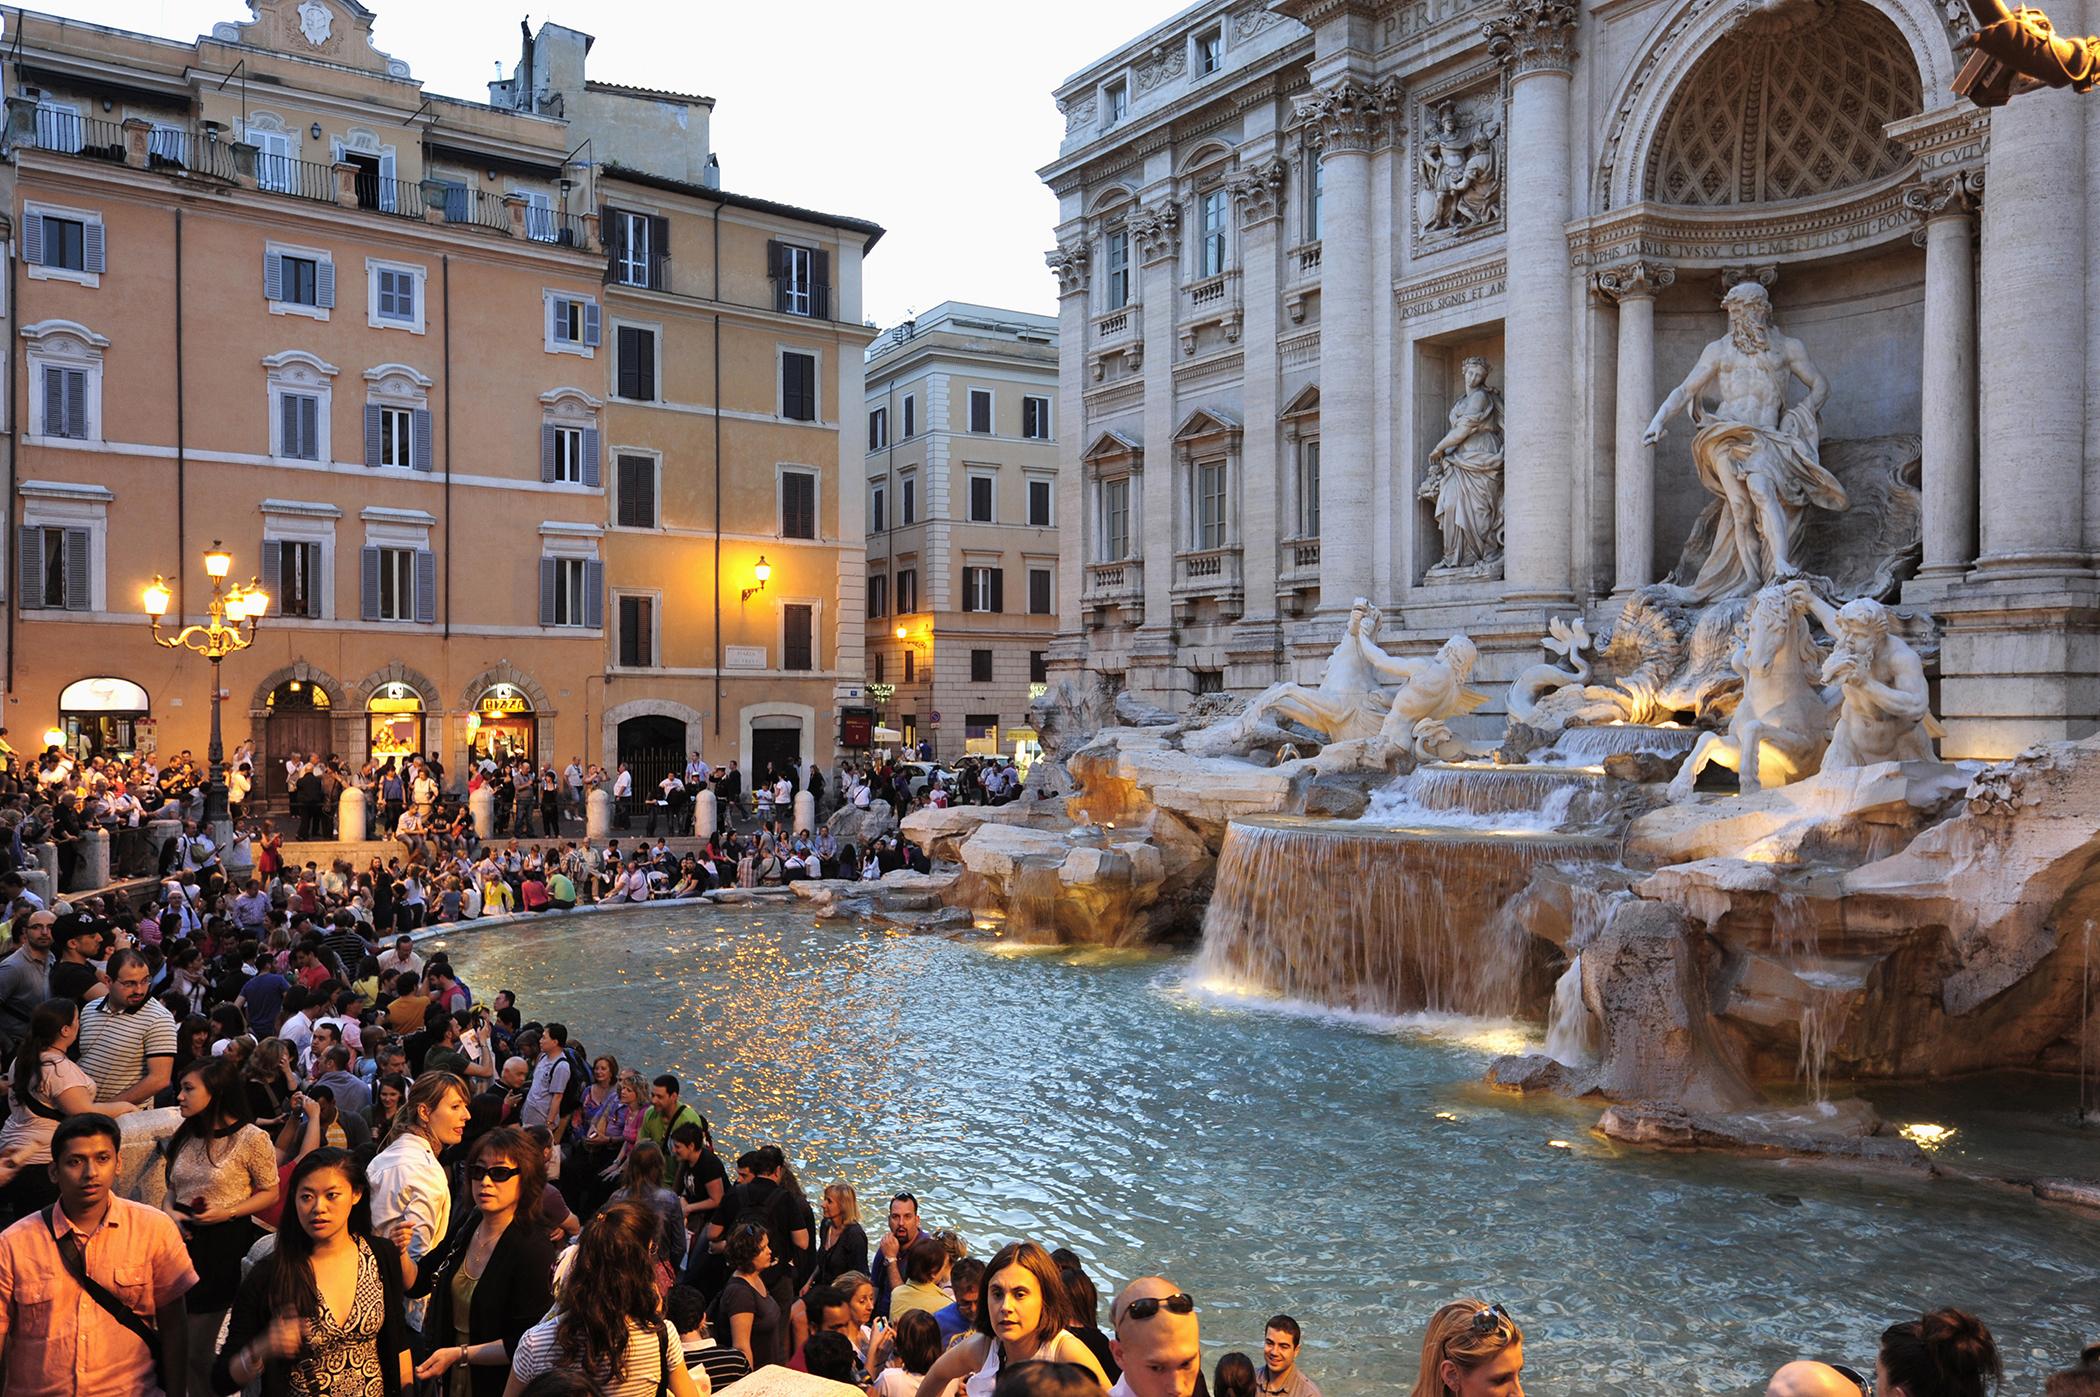 170407-europe-travel-rome